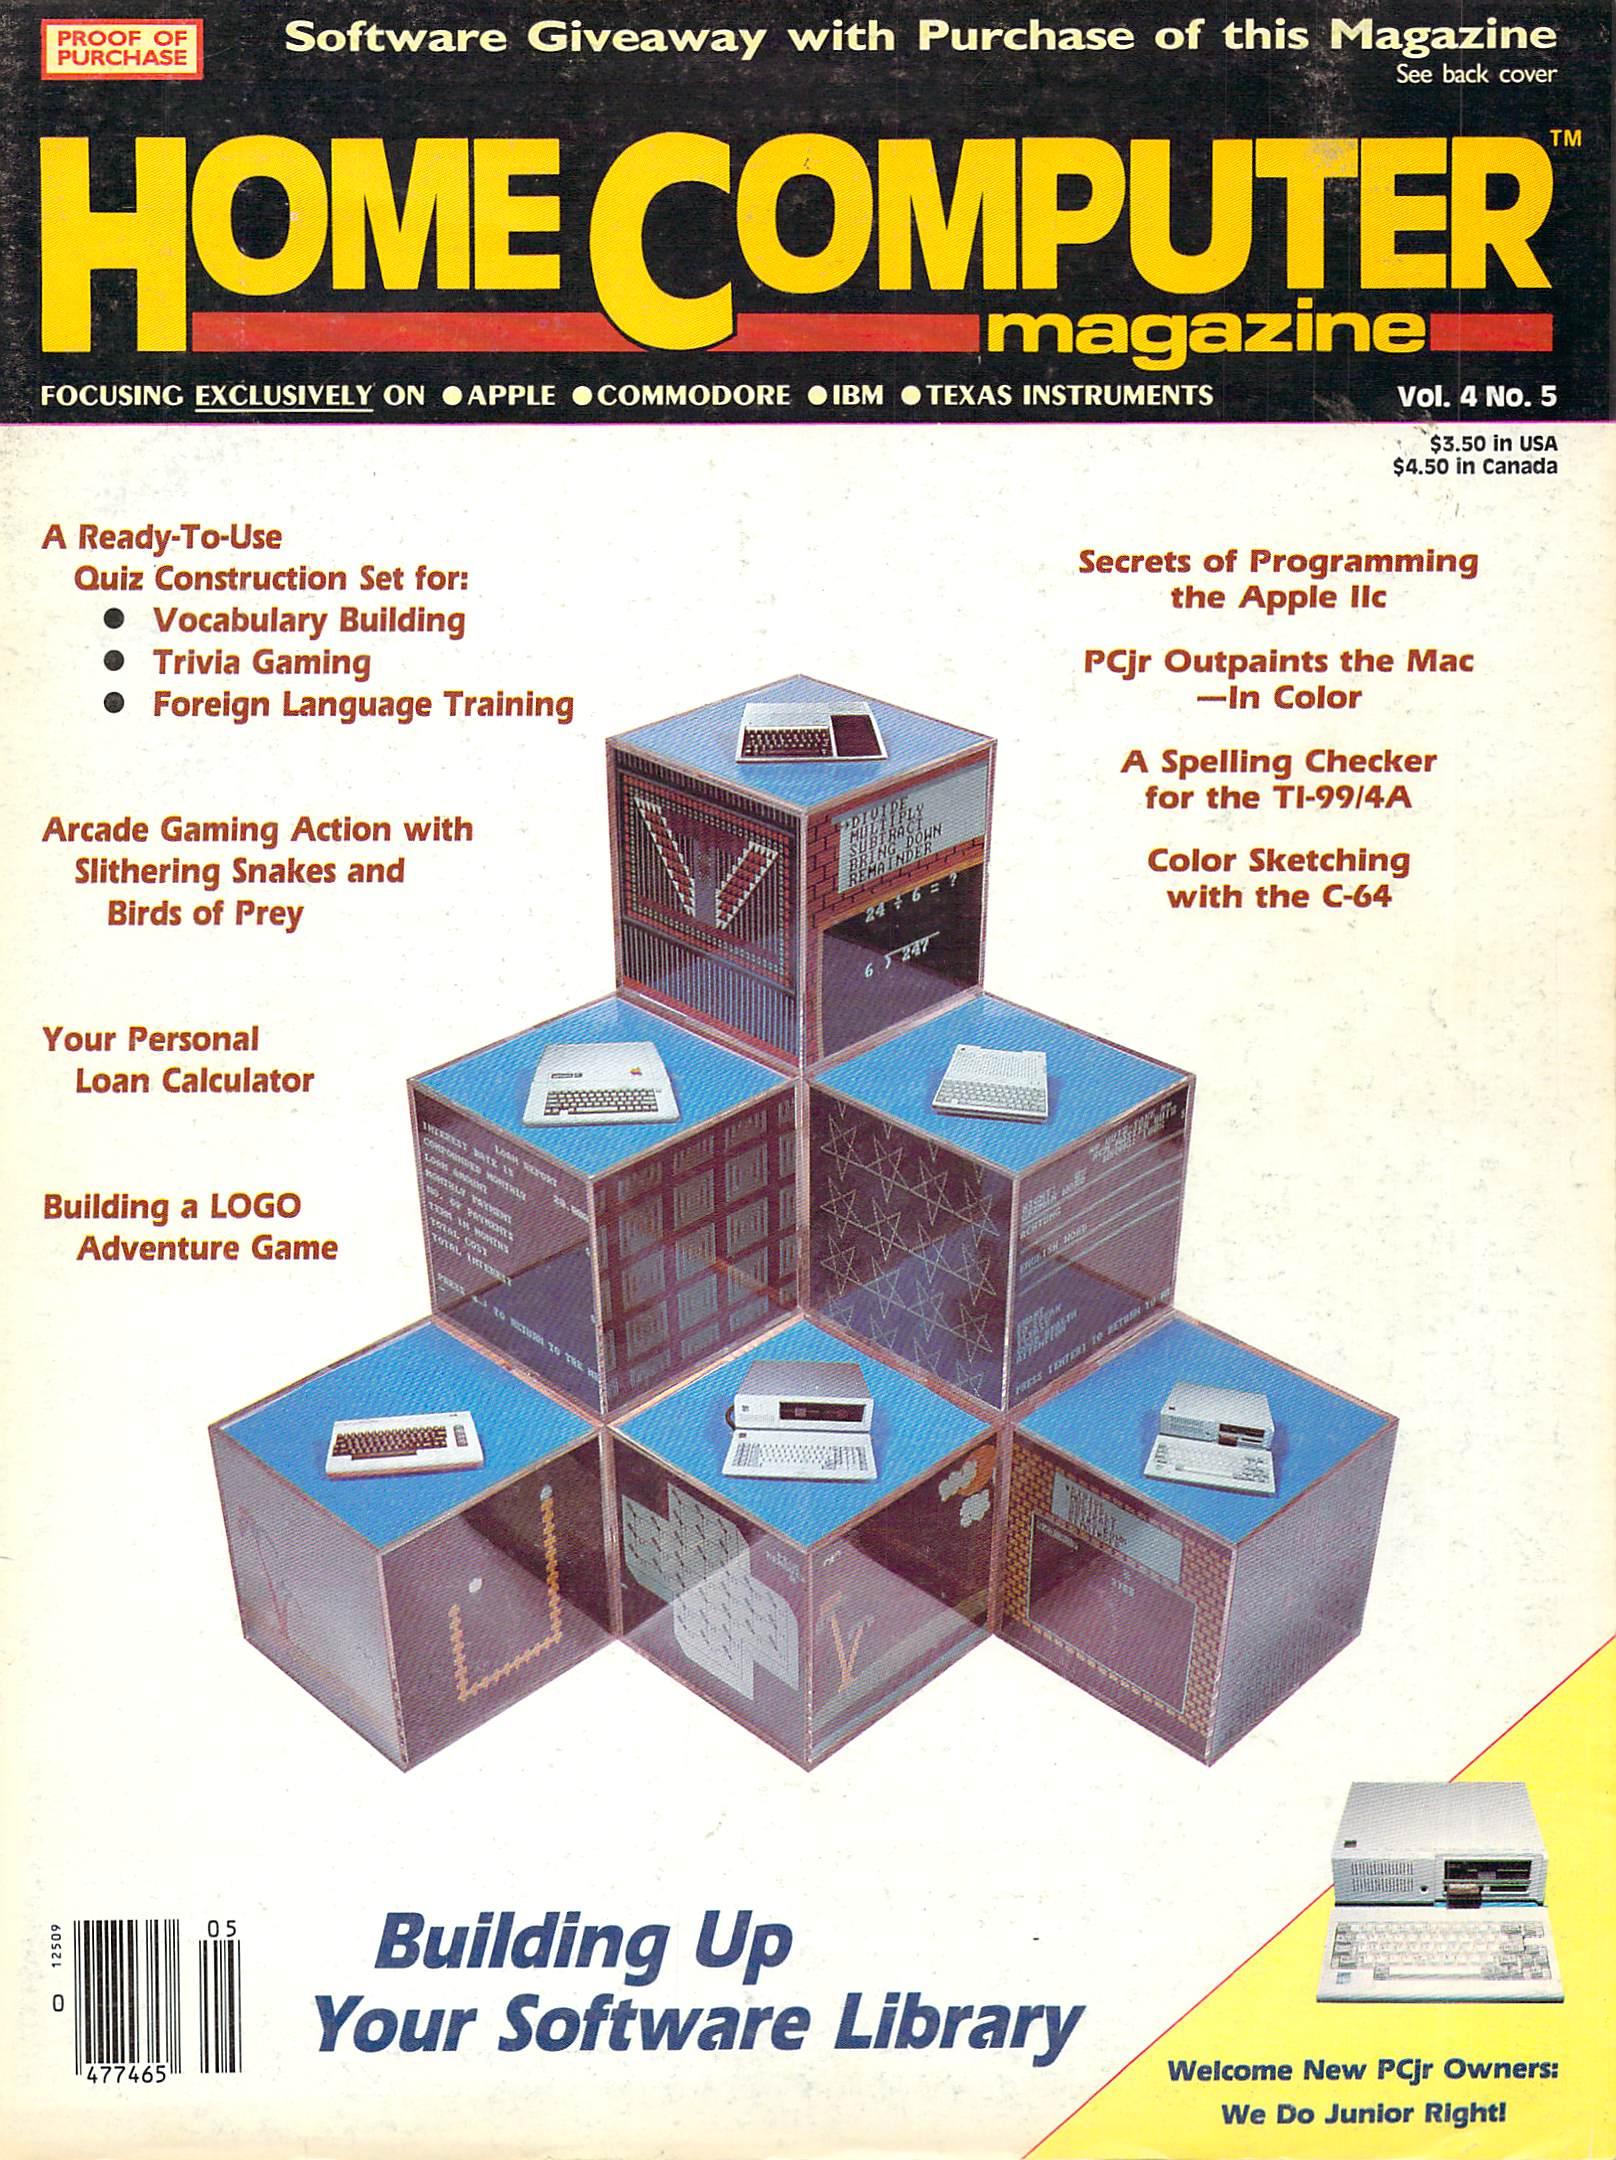 home_computer_magazine_vol4_05-001